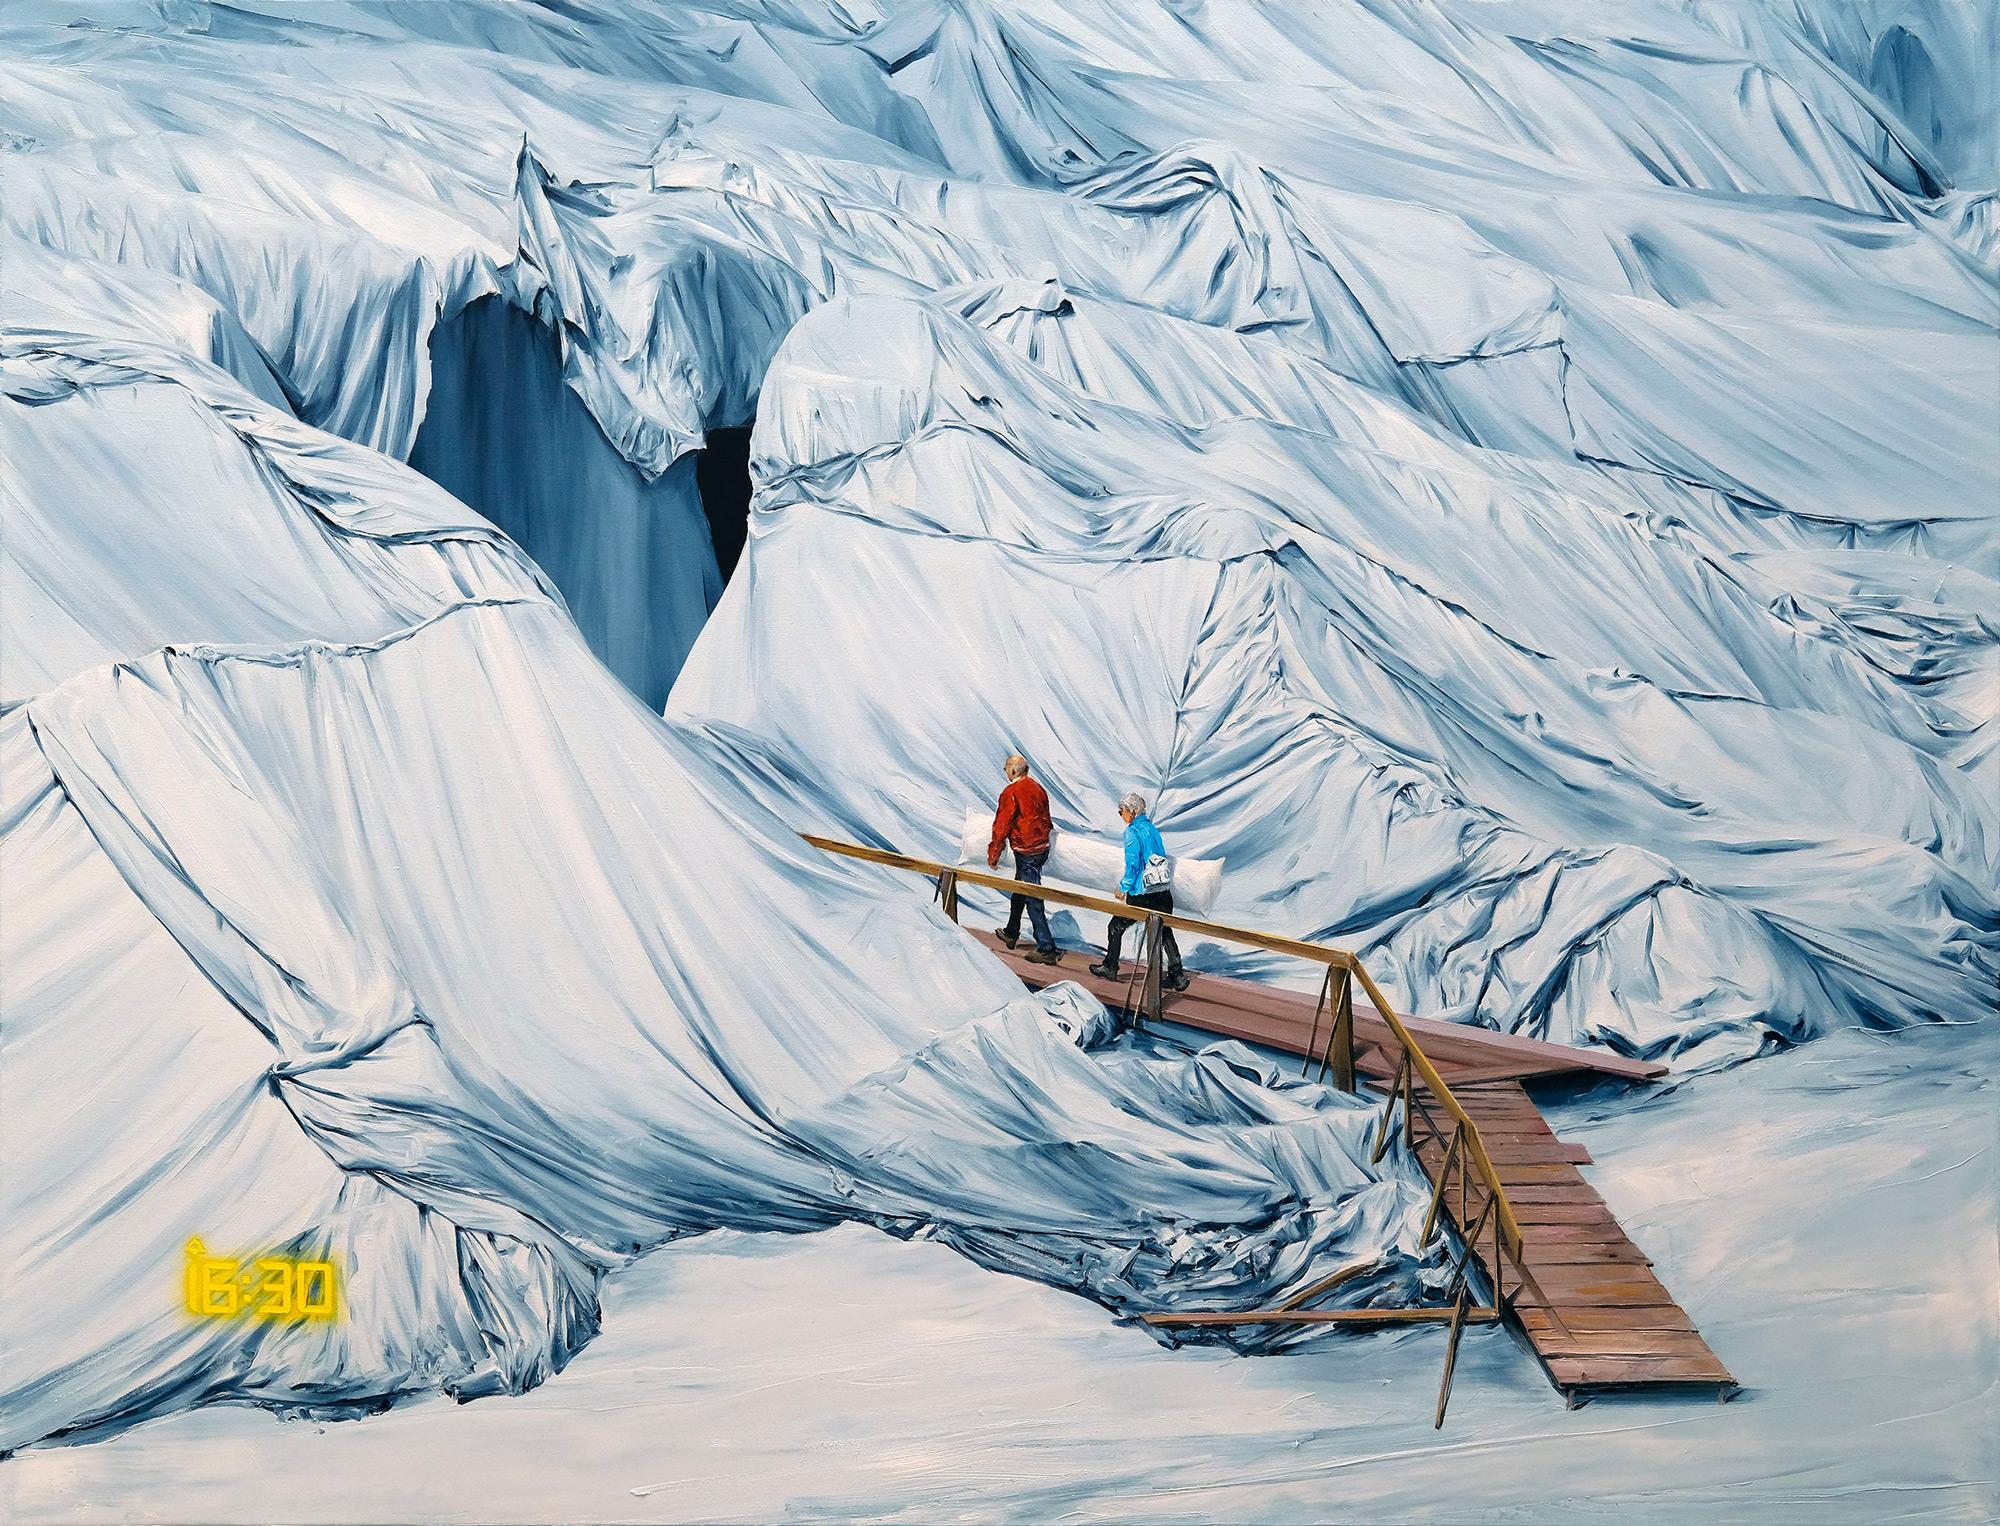 Siesta-Oil-on-canvas.-130-x-170-cm.-2018.jpg